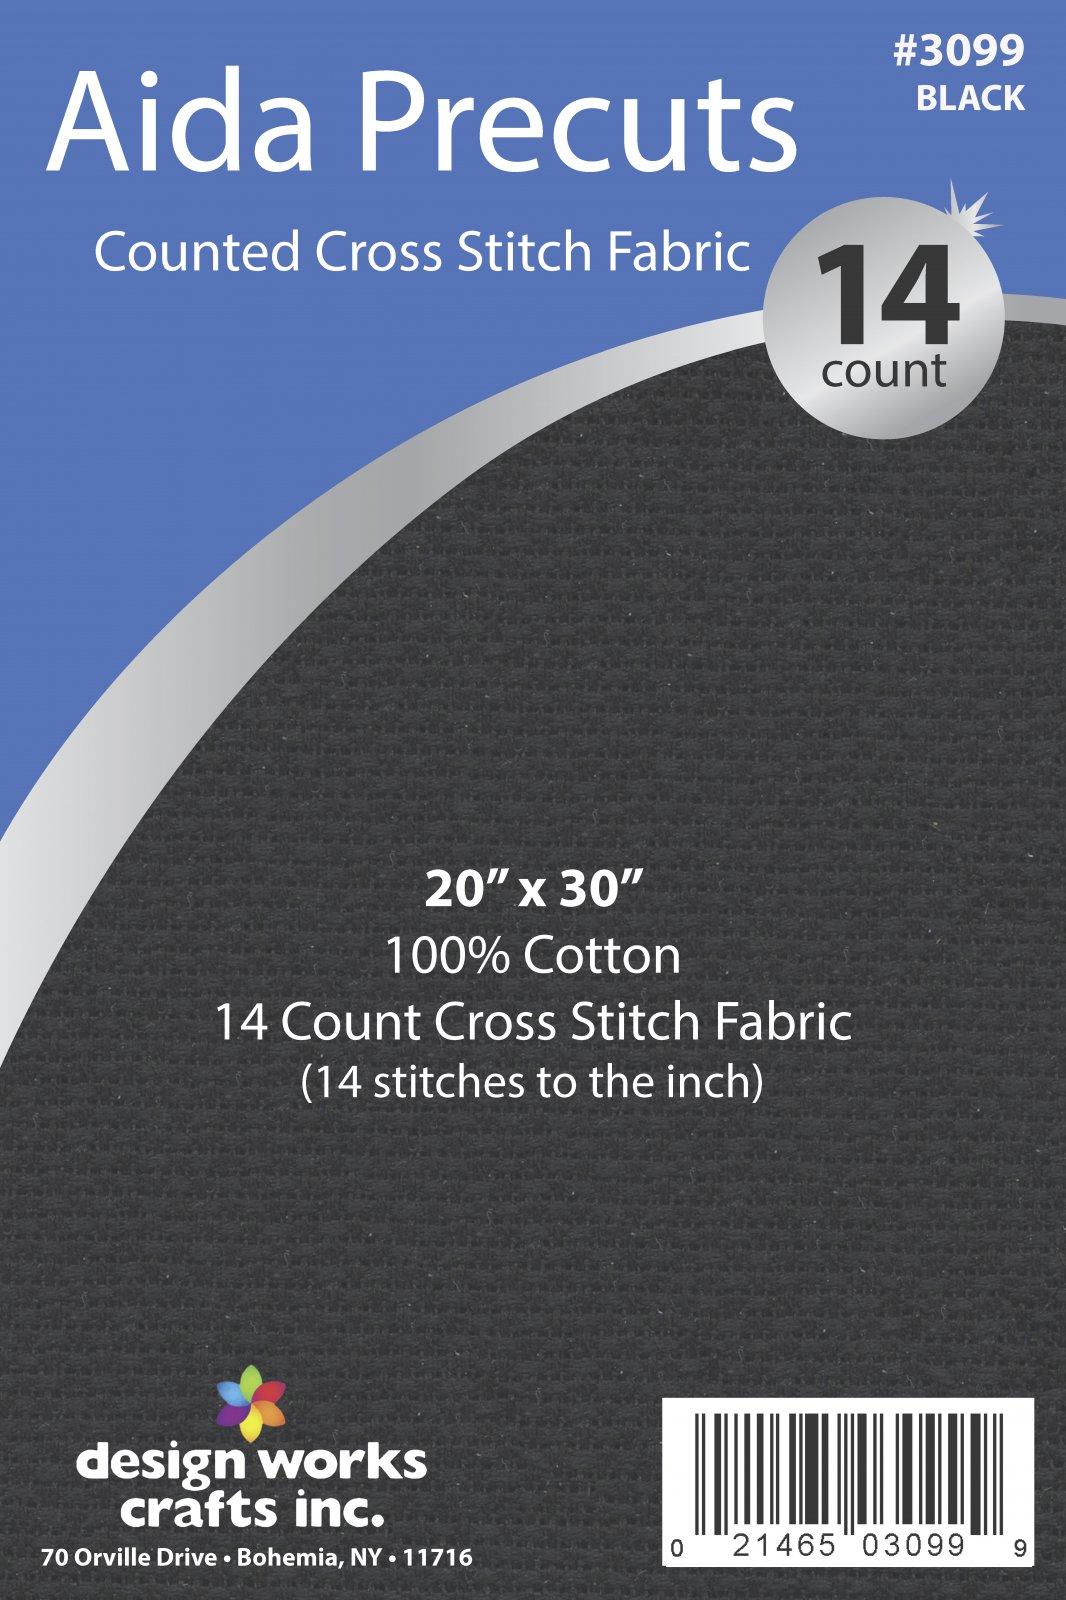 # 3099 - 14 Ct. Aida Pre-cut Counted Cross Stitch Fabric/Black - 20 x 30